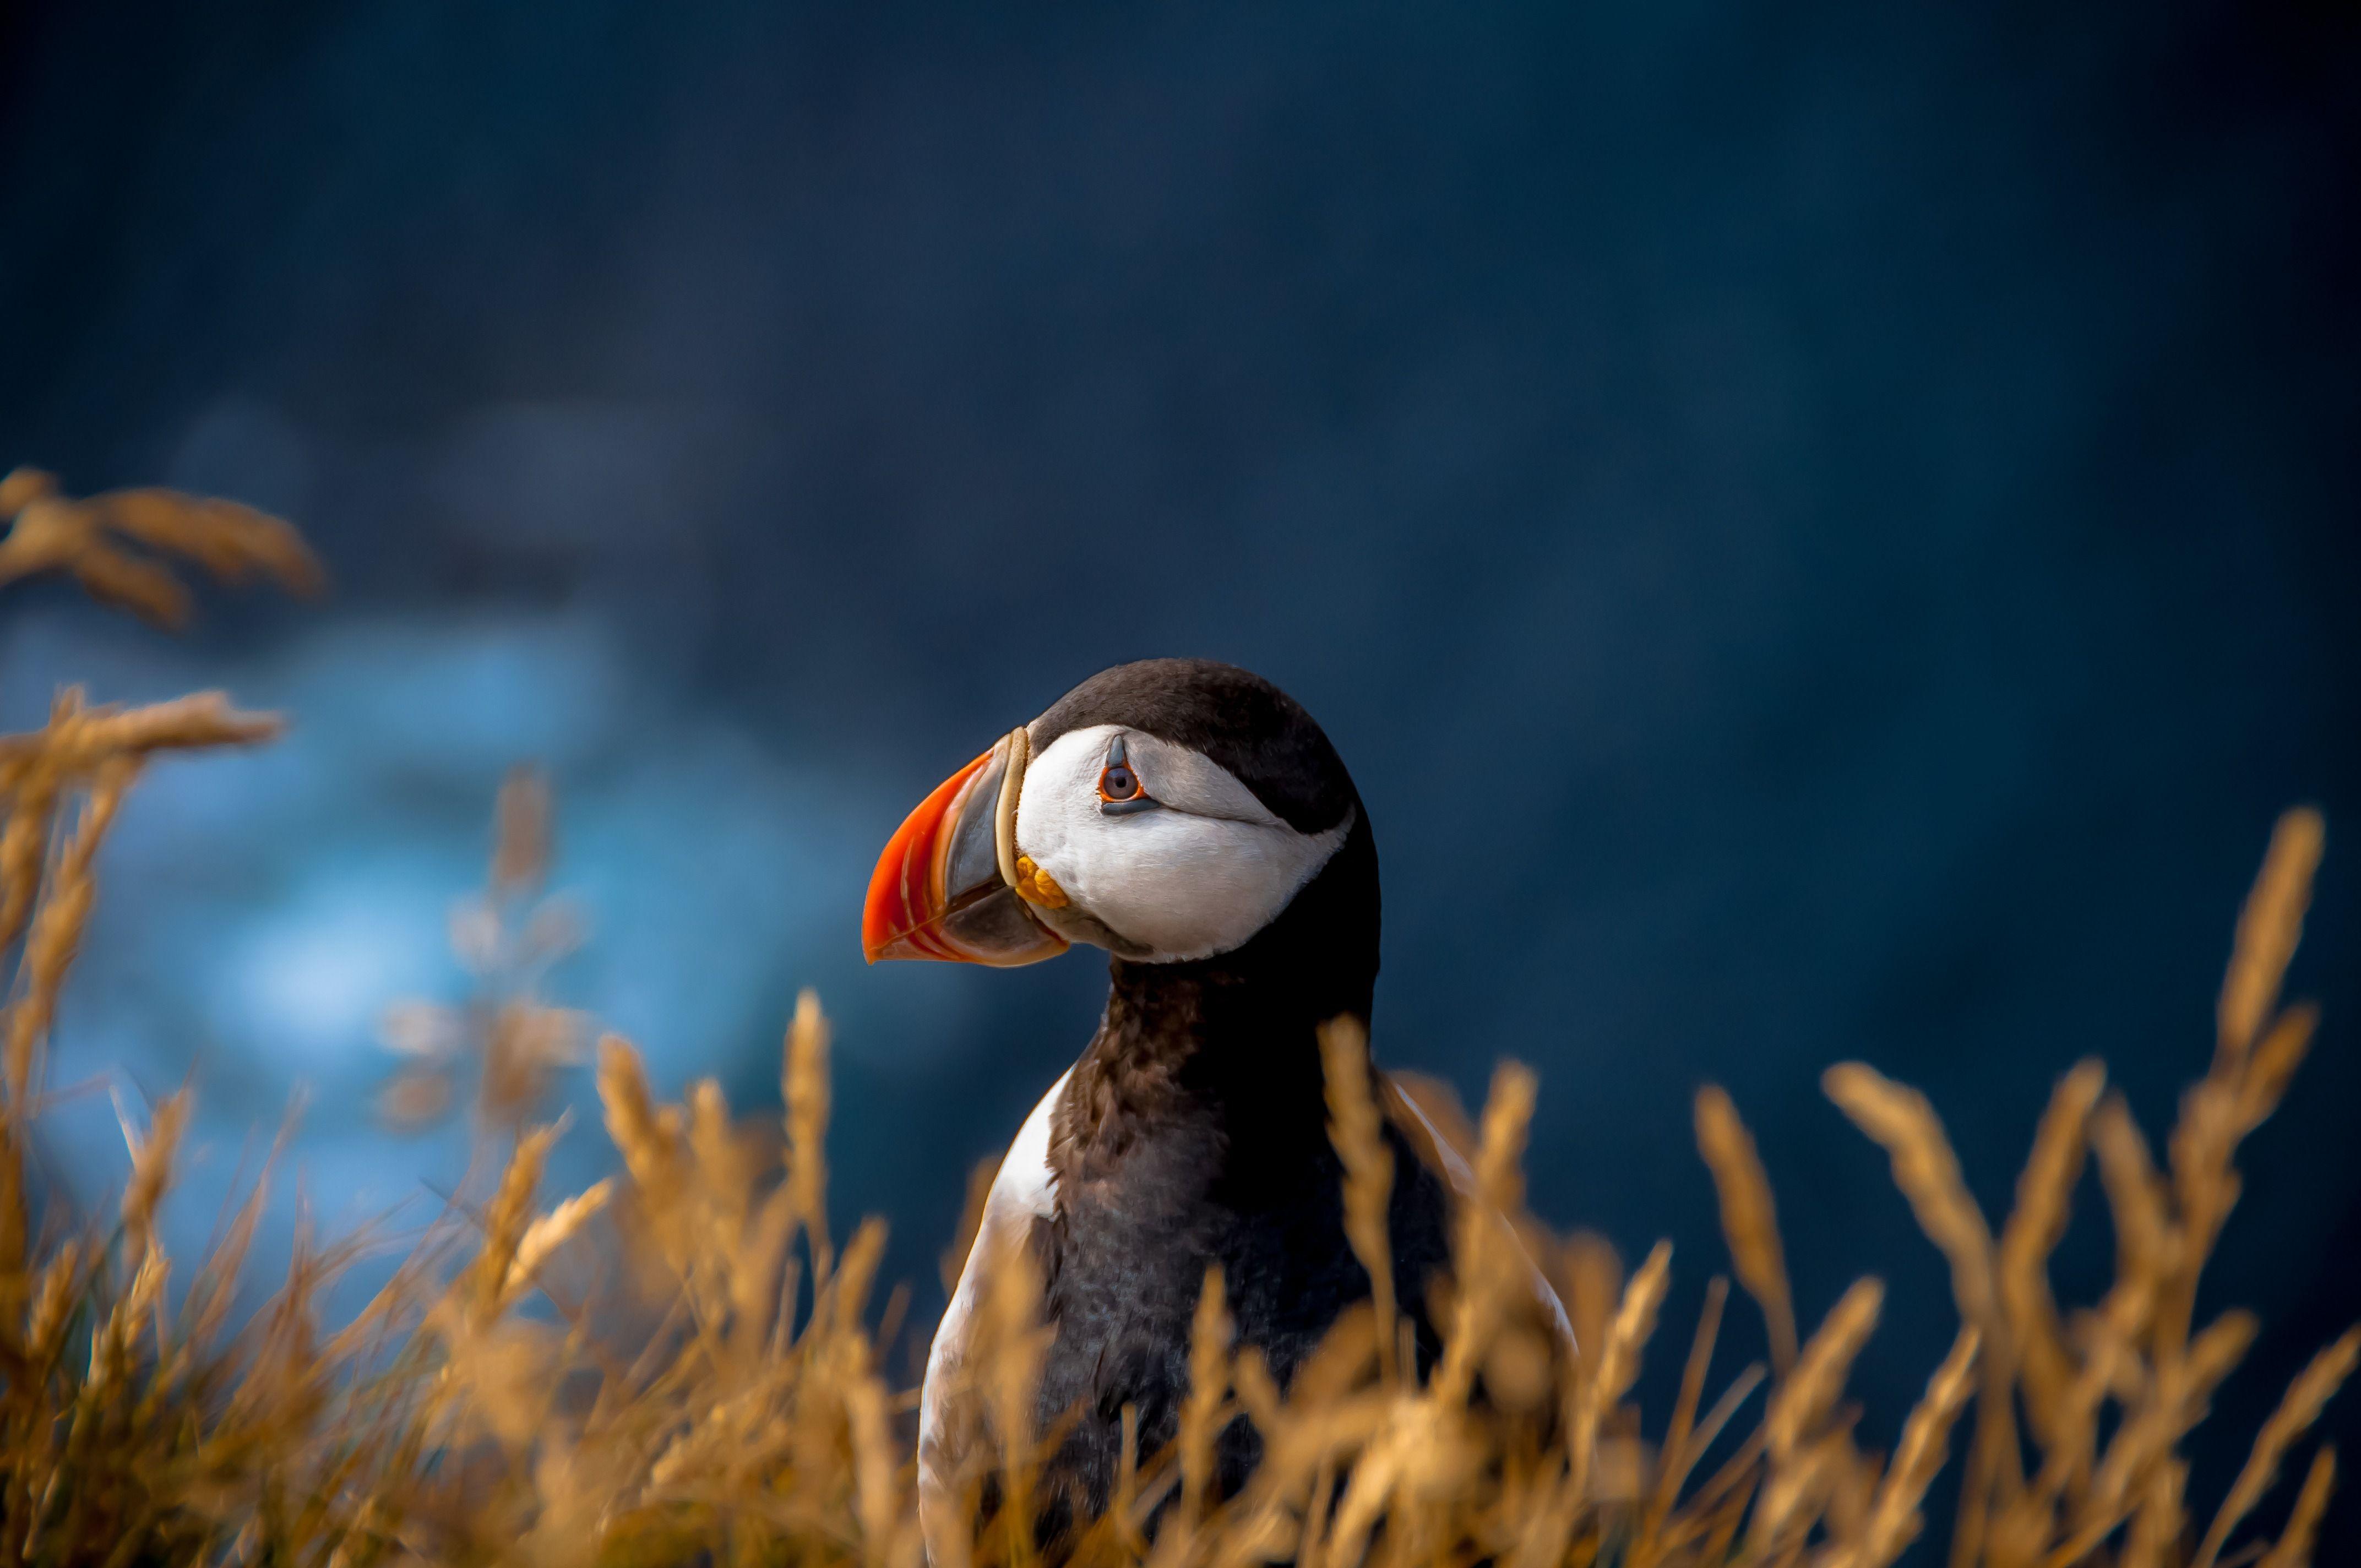 Puffin Photograph By Chris Zielecki National Geographic Your Shot Puffins Bird Animals Birds